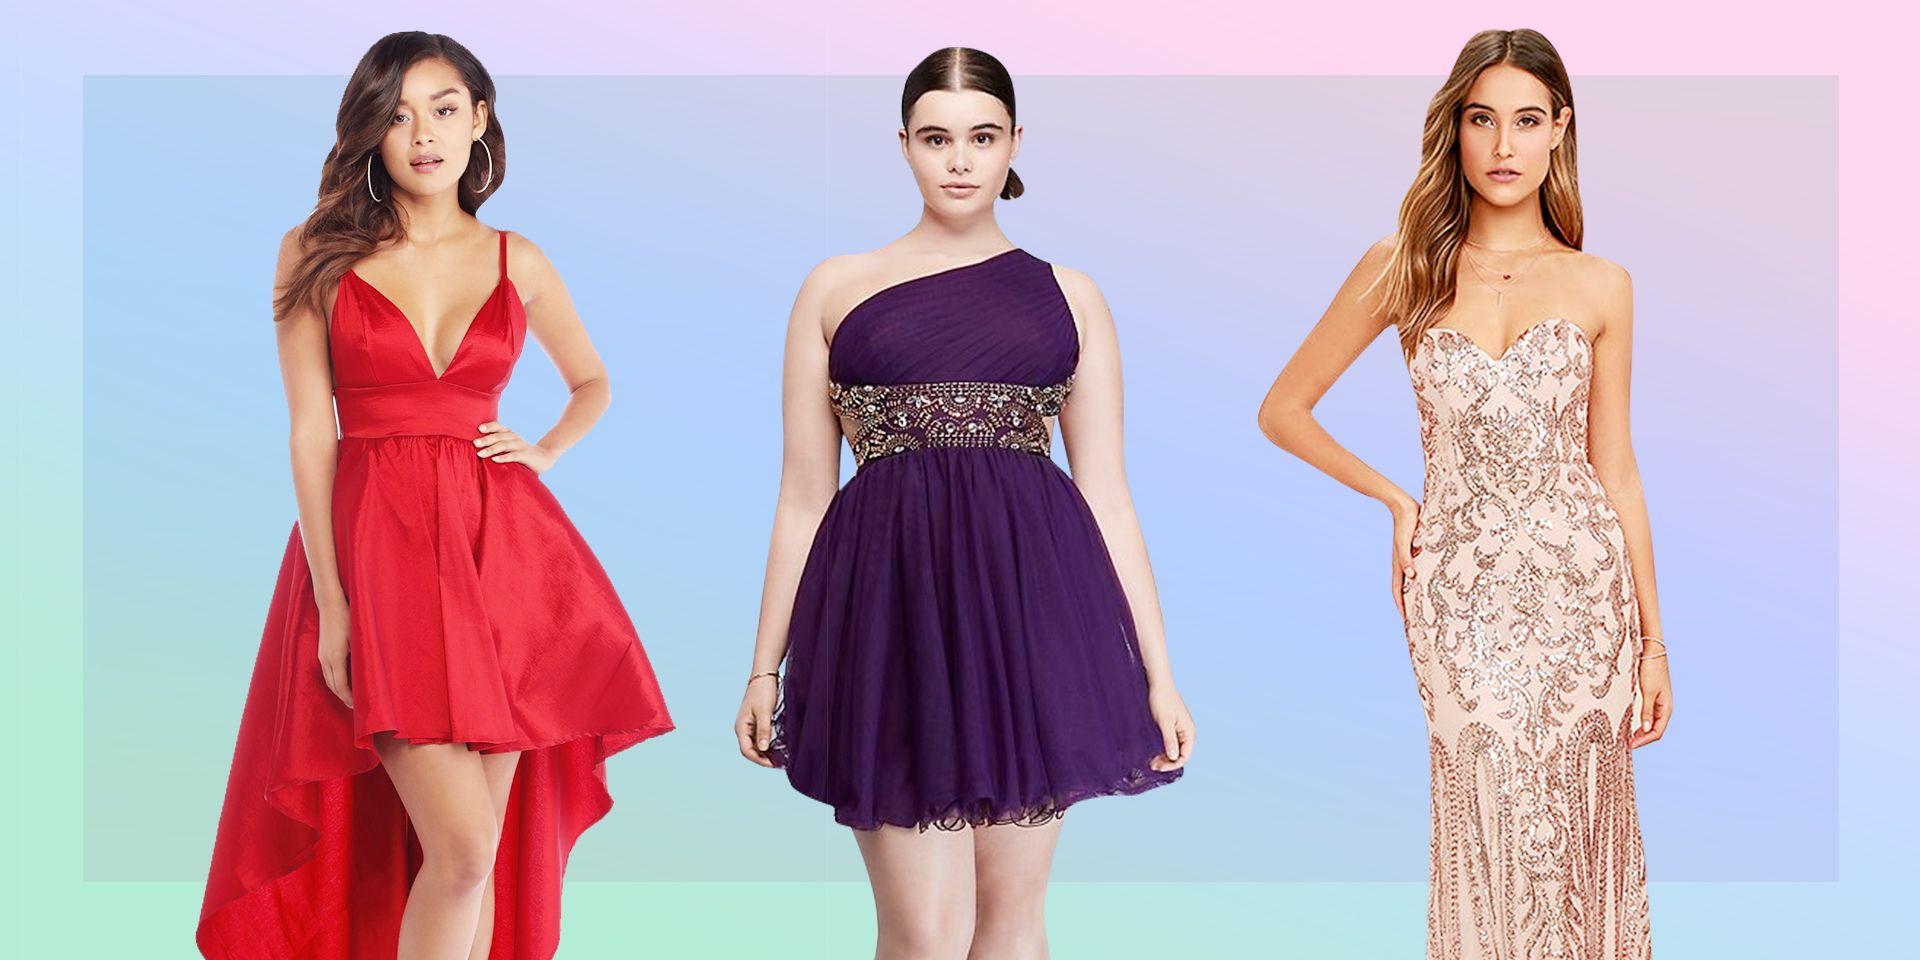 20 Best Cheap Prom Dresses 2018